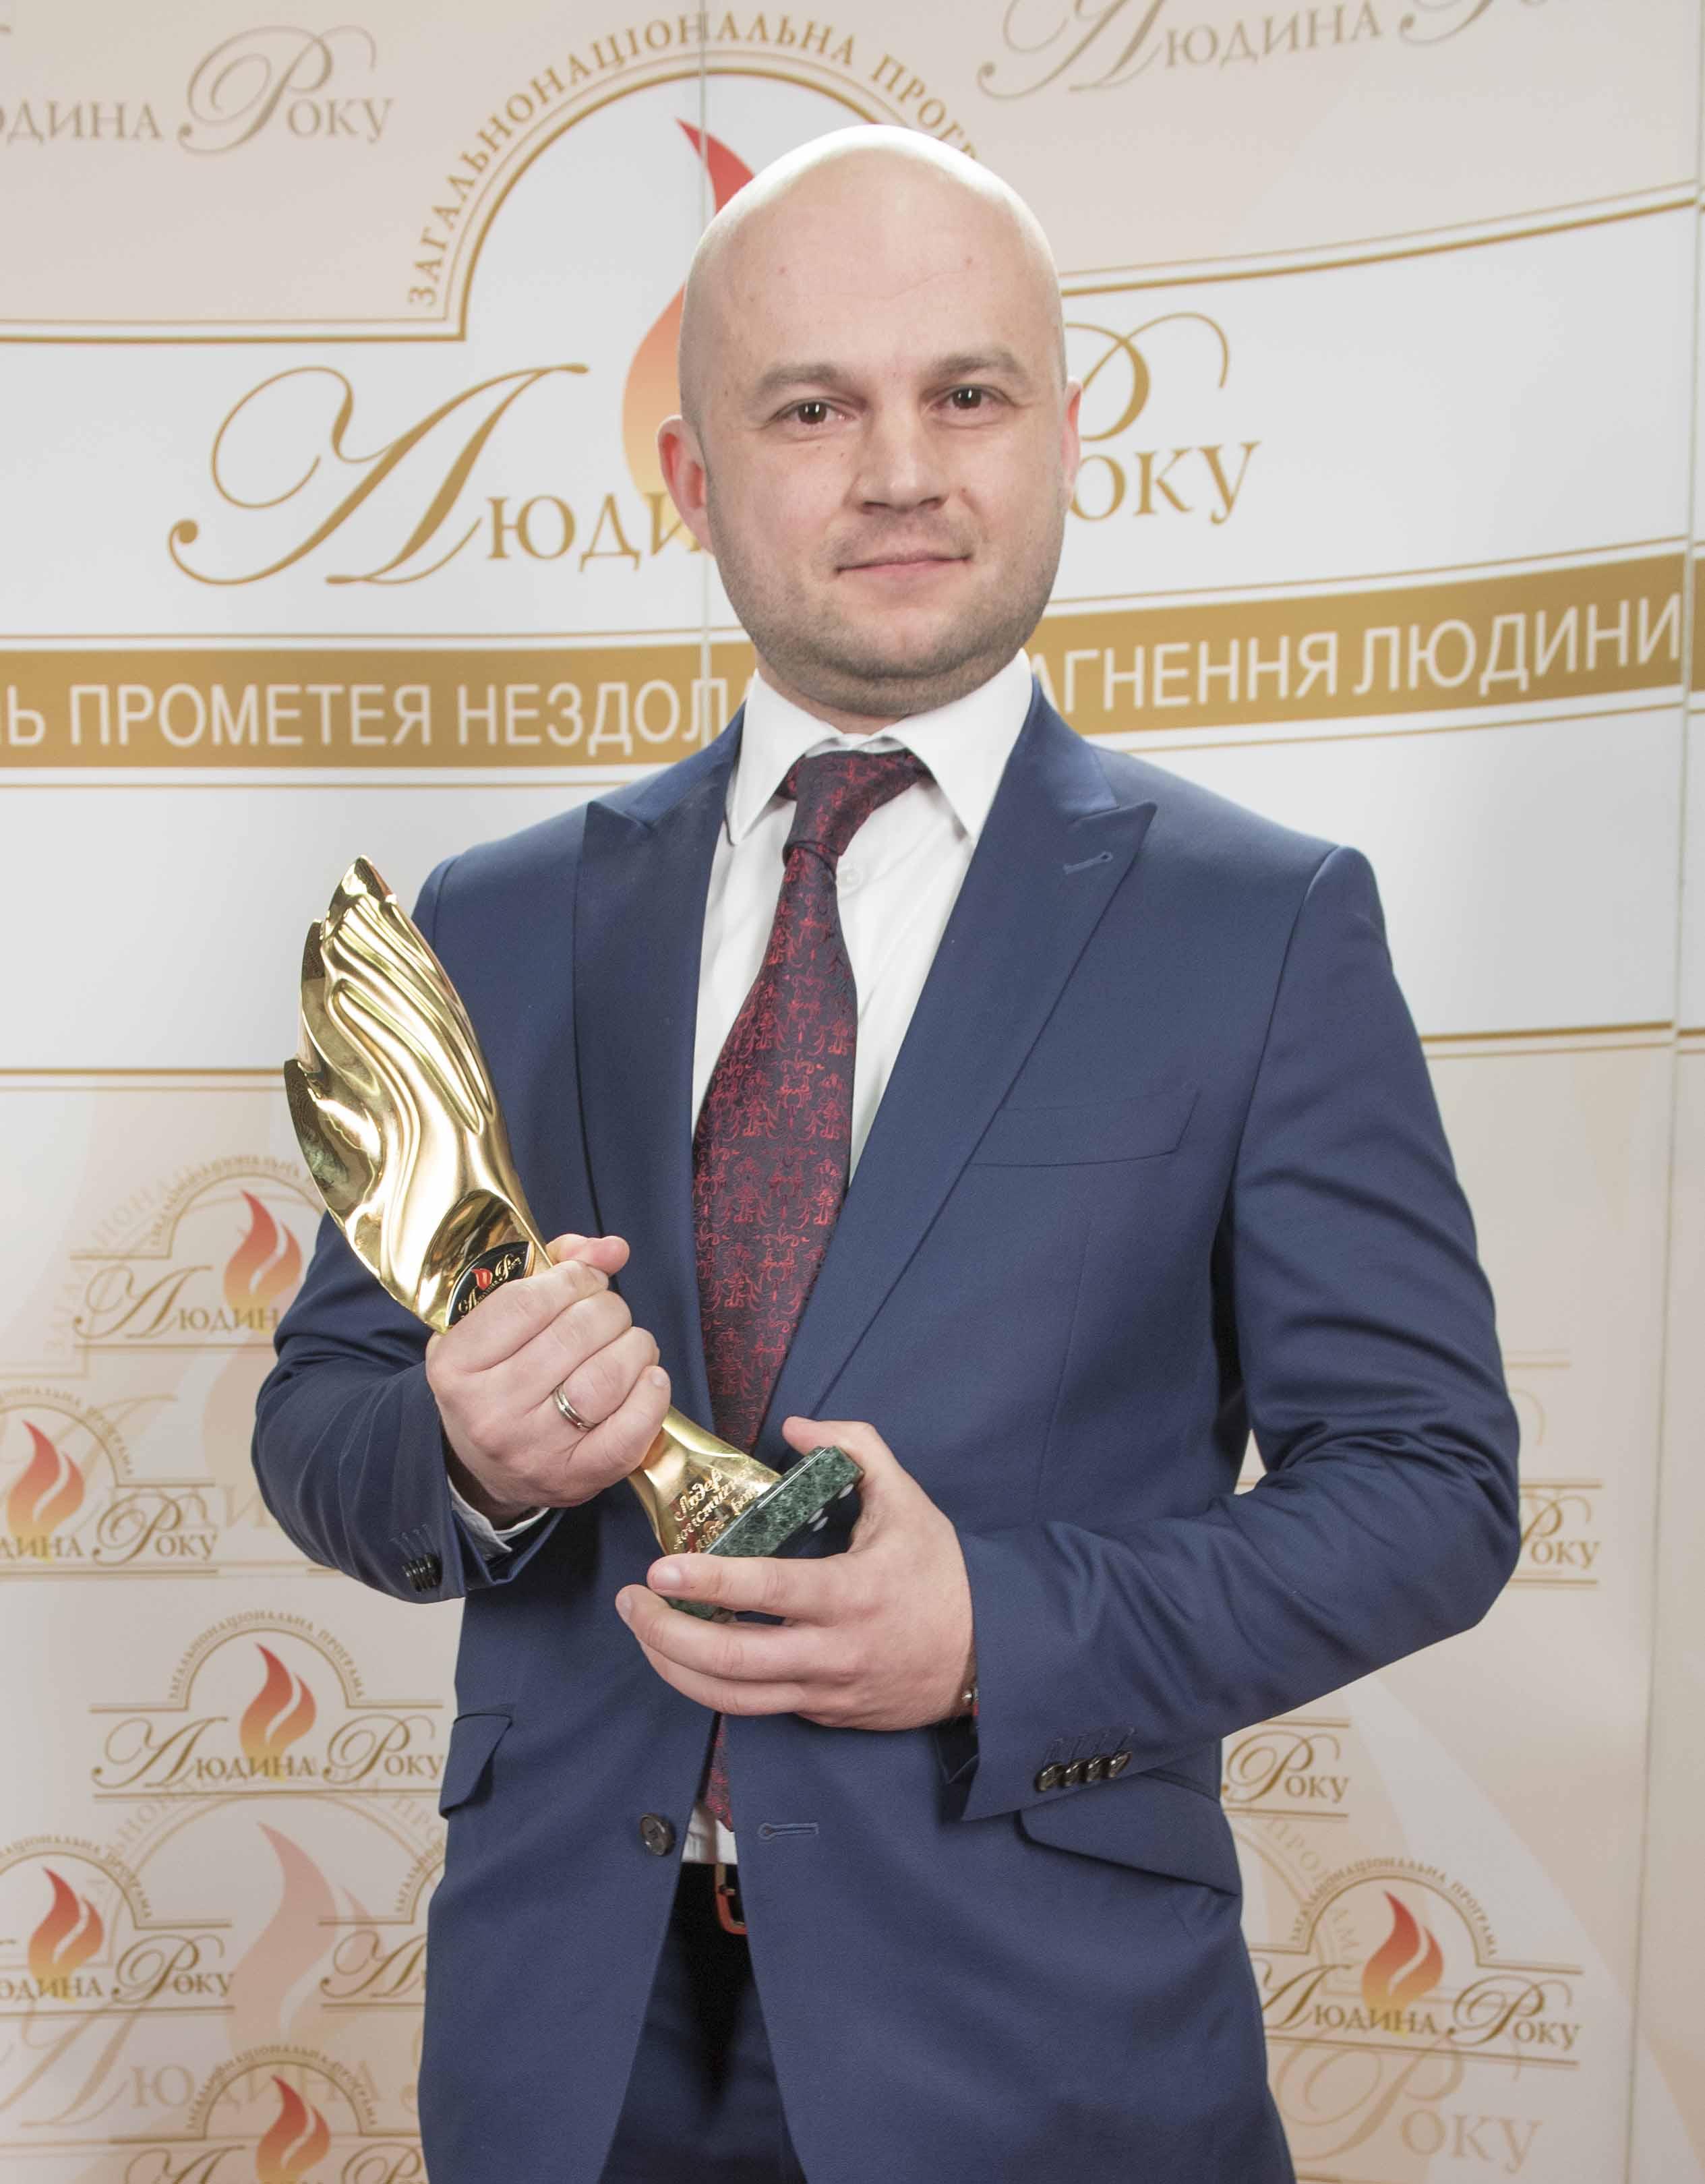 Богуцкий